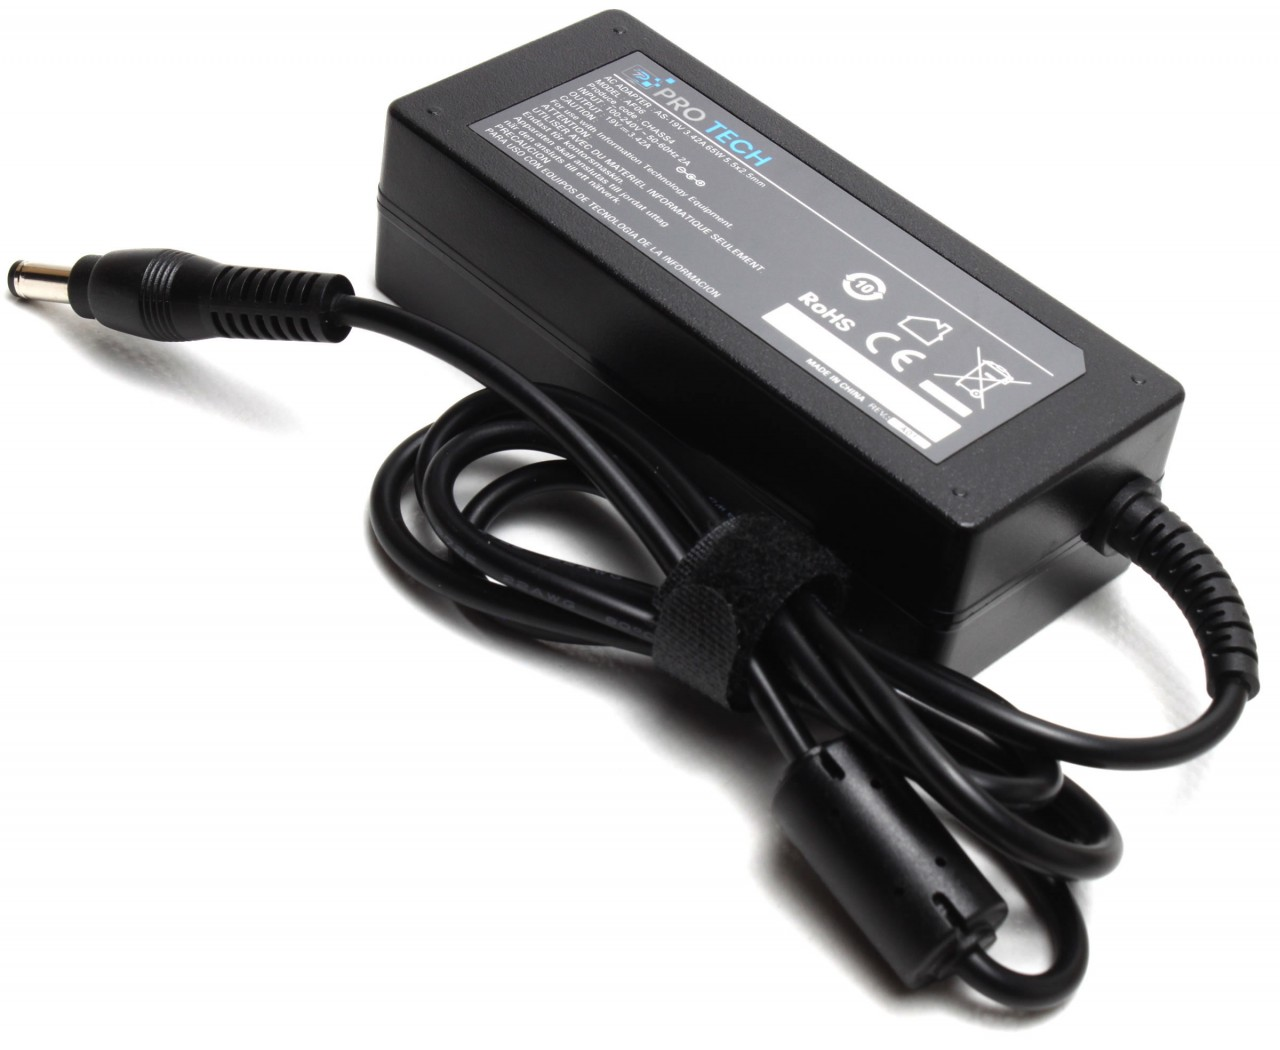 Incarcator MSI A6000 Replacement imagine powerlaptop.ro 2021